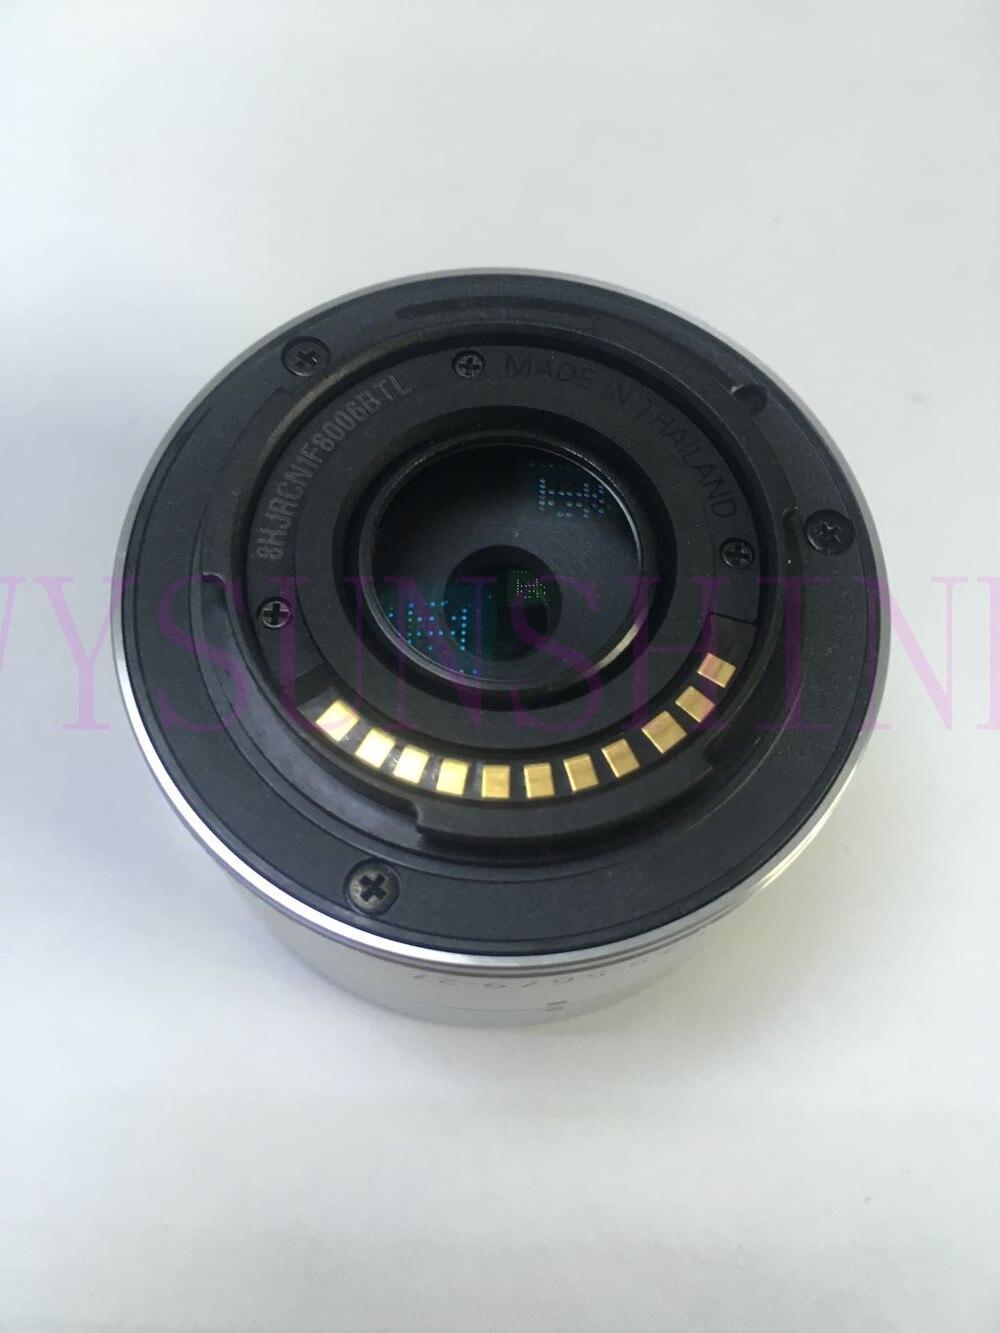 Envío Gratis Original NX 9-27mm F3.5-5.6 zoom lente para Samsung mini miniatura SLR